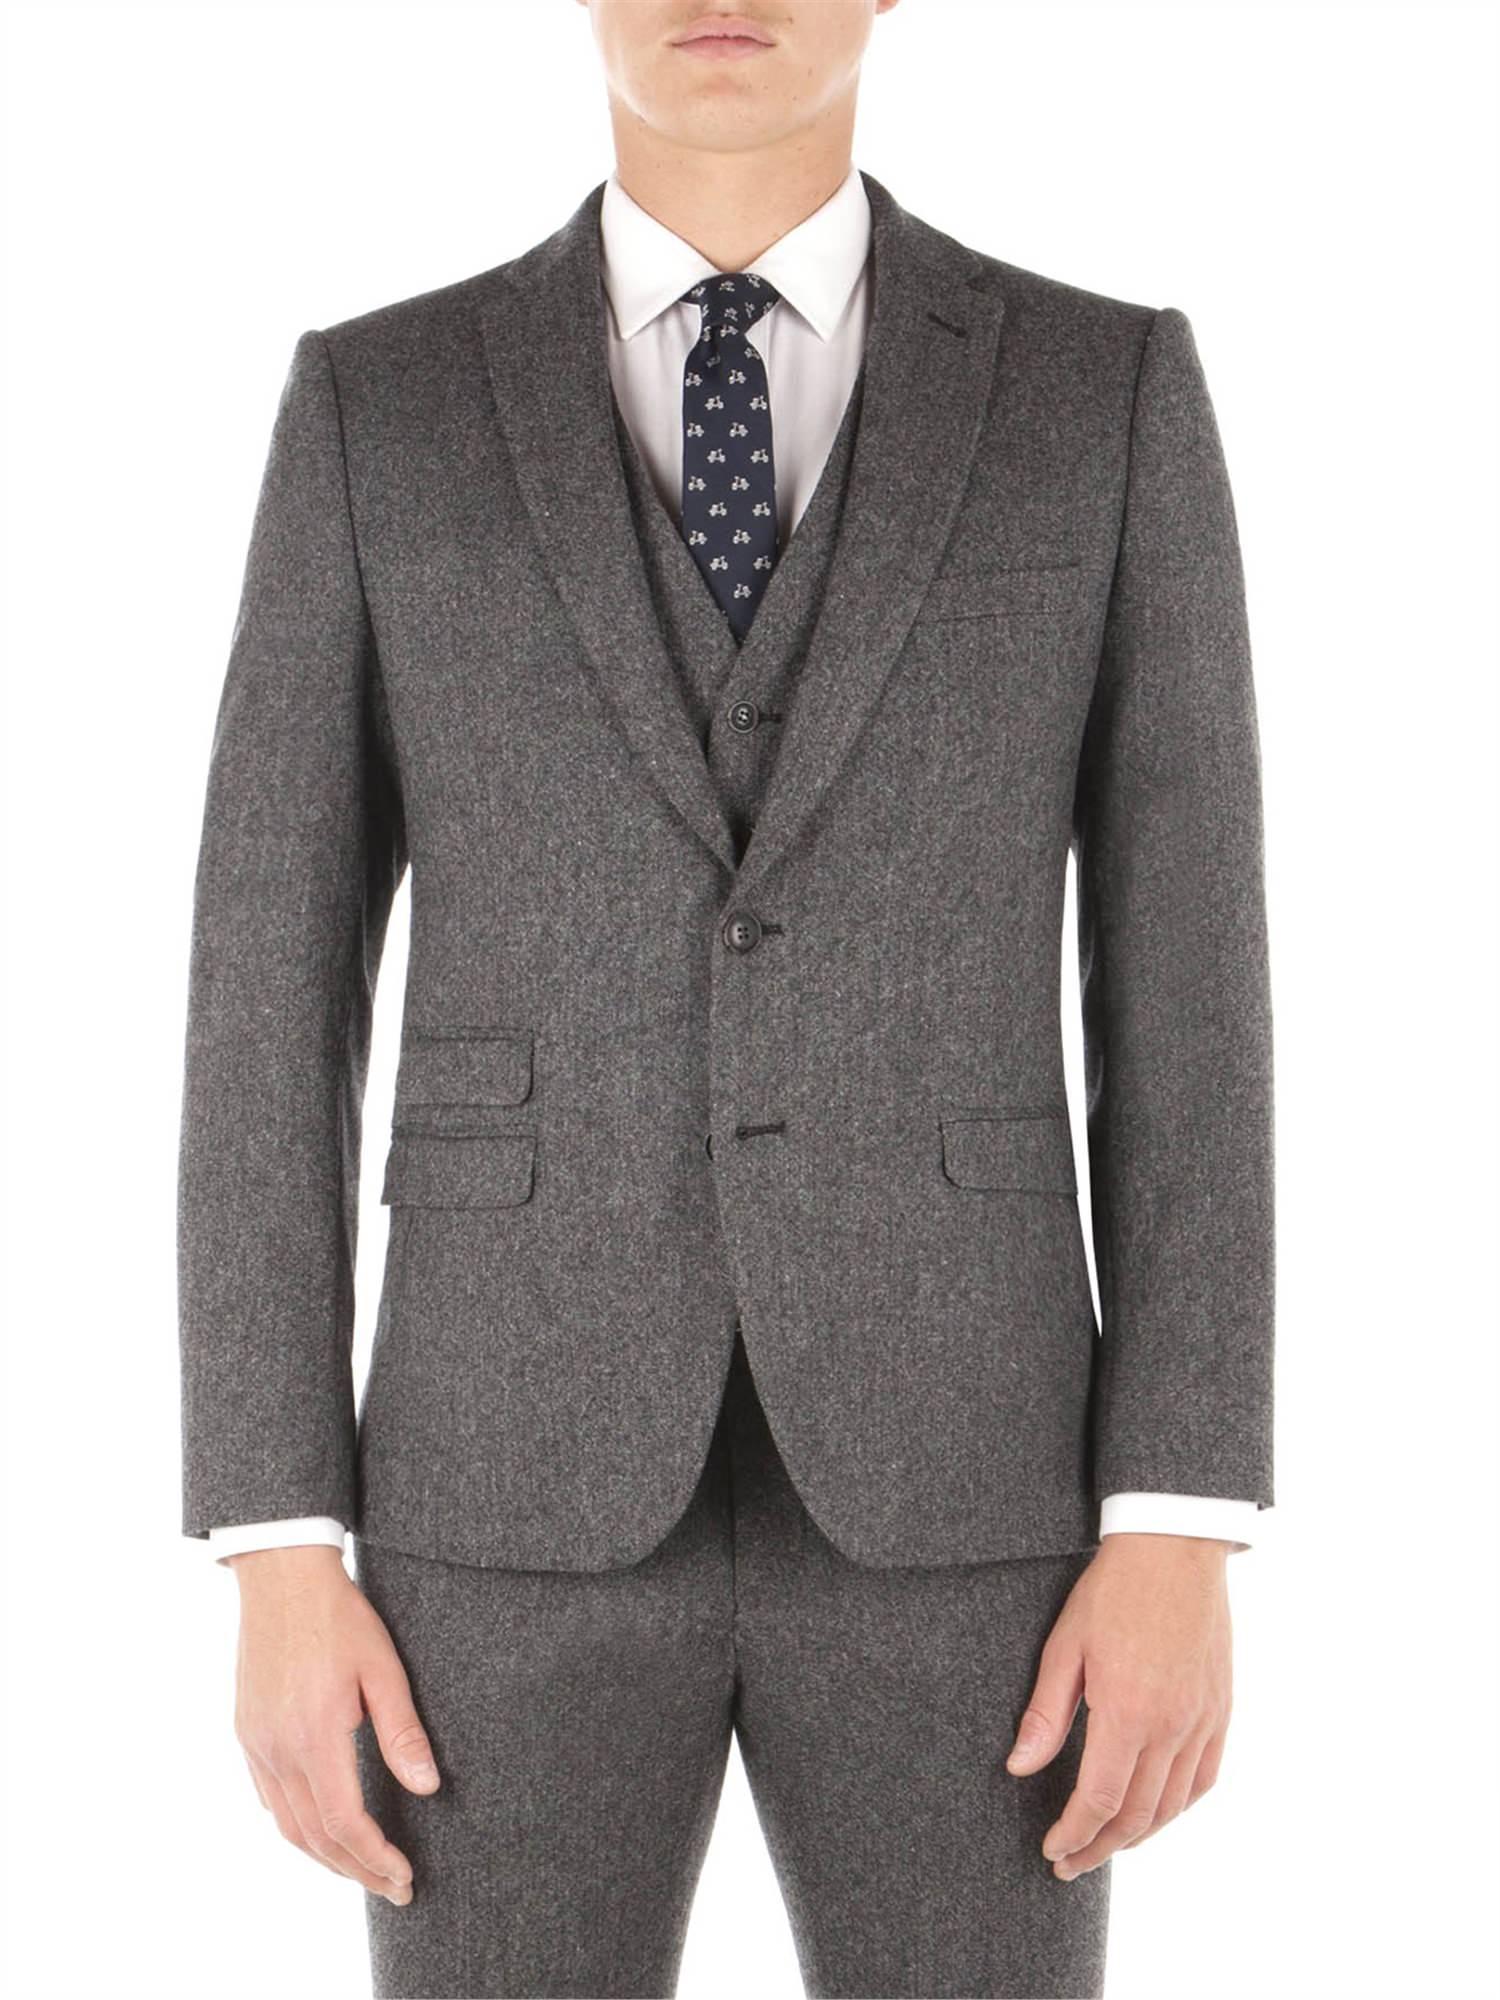 big collection exceptional range of styles and colors special buy Men's Grey British Tweed 2 Piece Suit | Ben Sherman | Est 1963